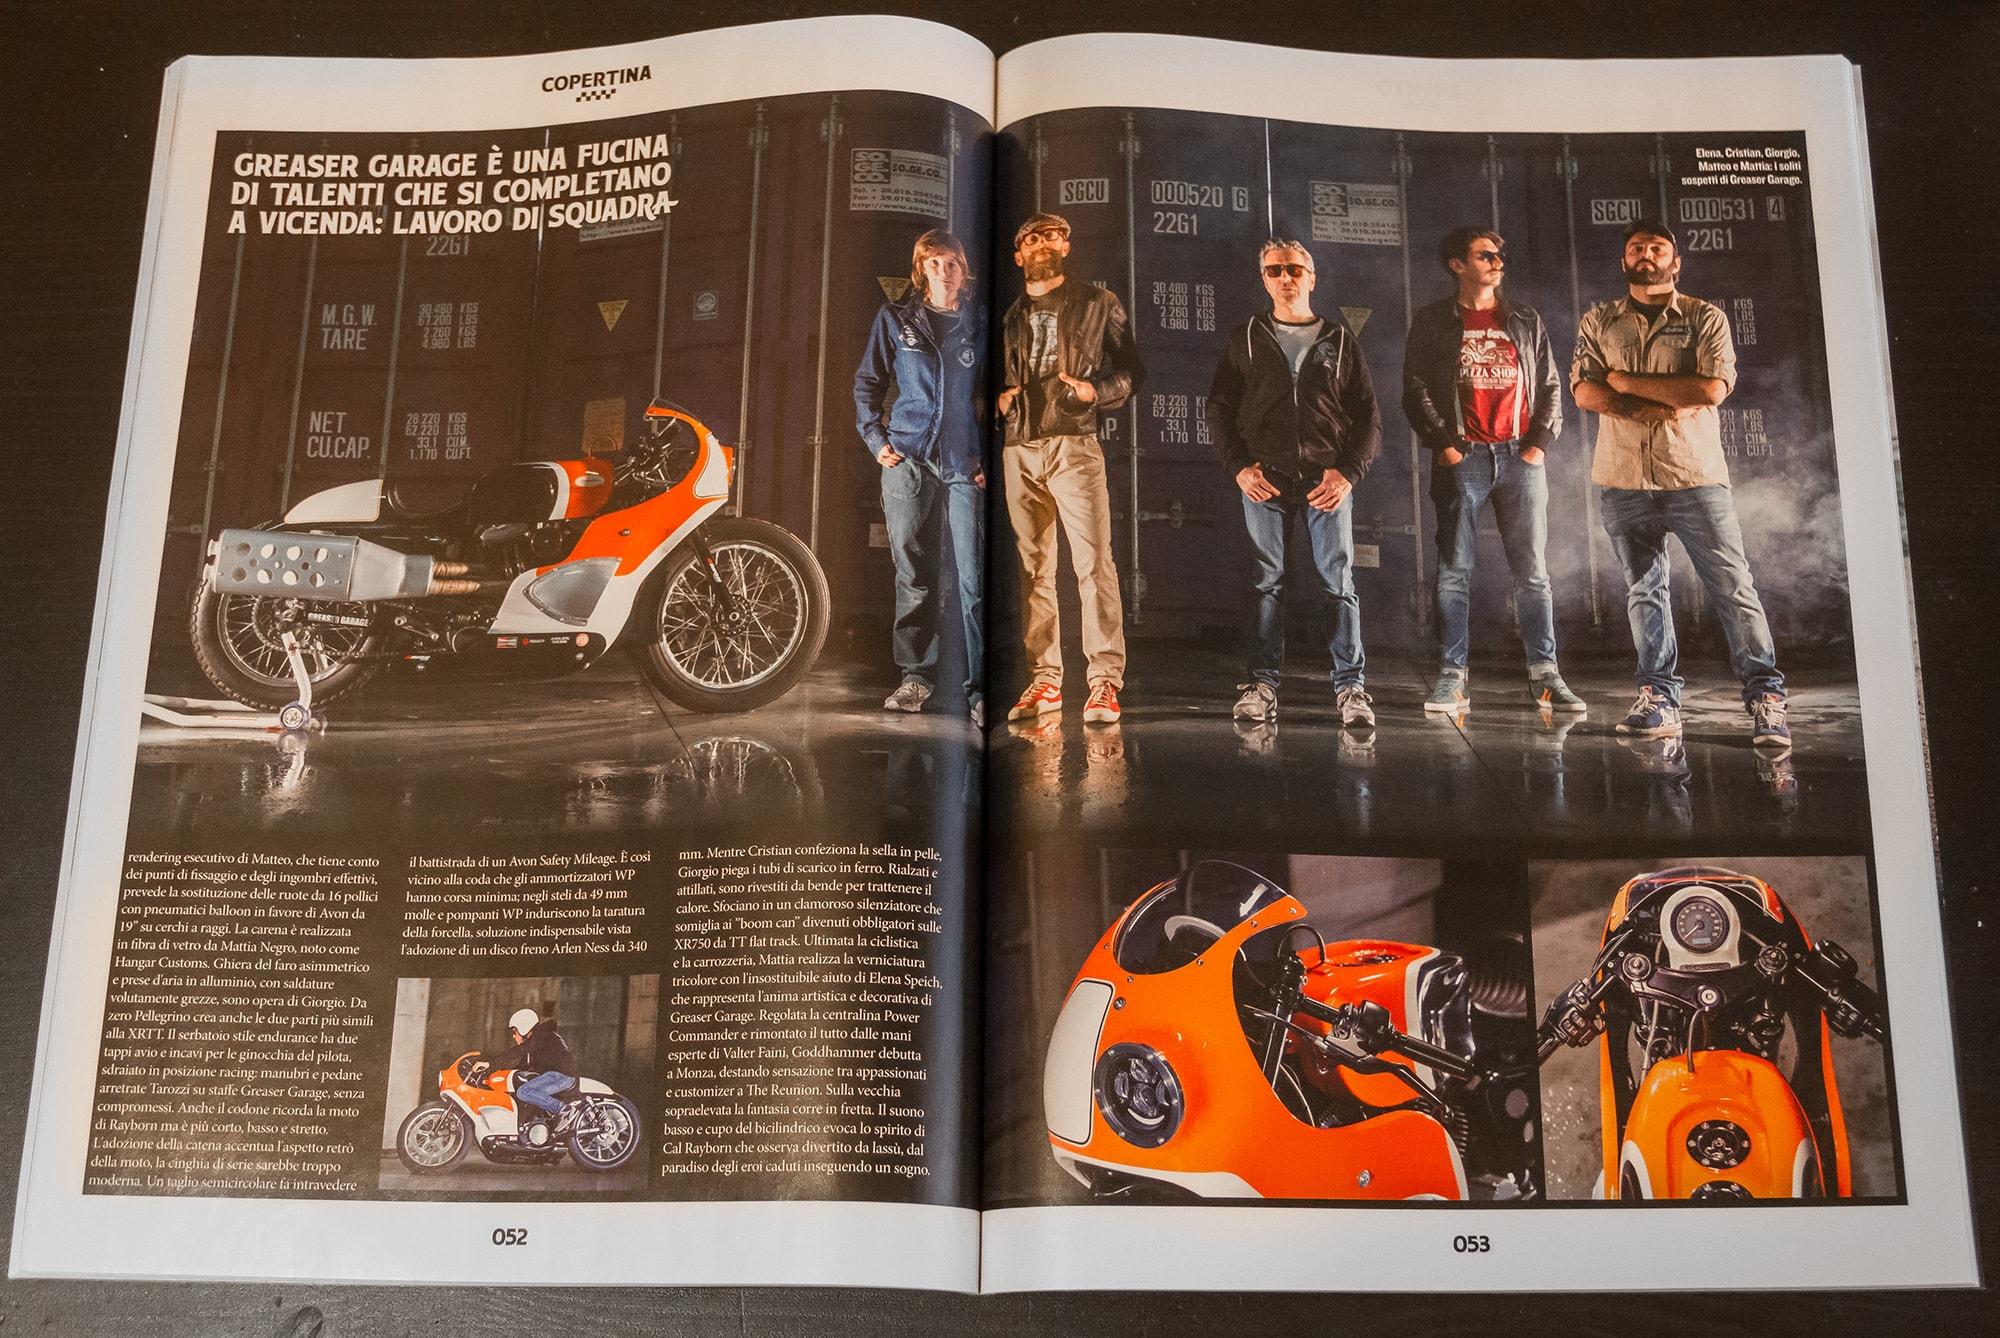 Harley Goddhammer by Greaser Garage